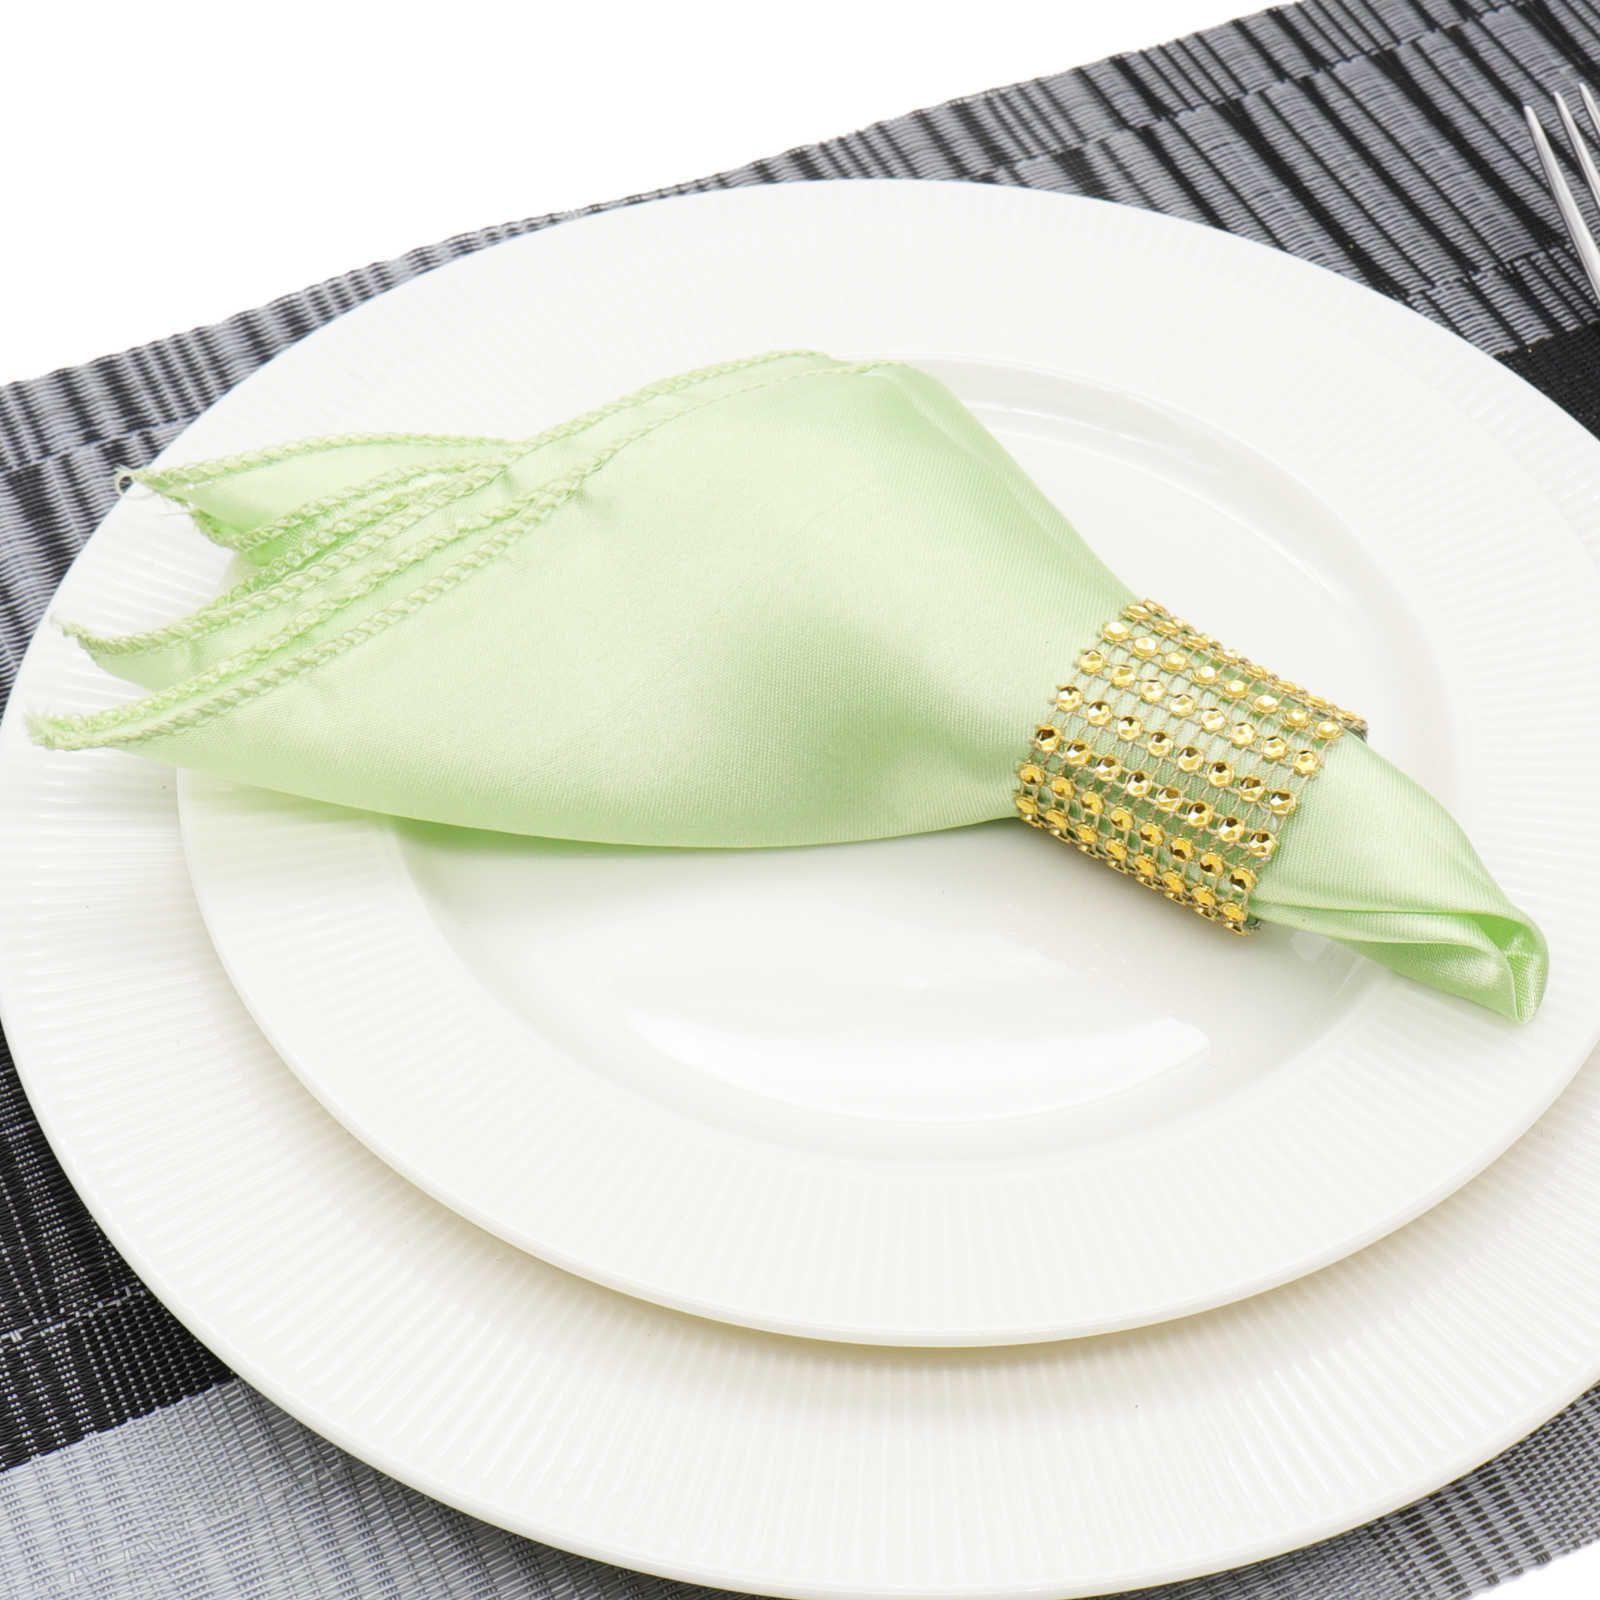 1pcs 30cm Table Napkin Square Satin Fabric Pocket Handkerchief Cloth For Wedding Decoration Event Party Hotel Home Supplies C19021301